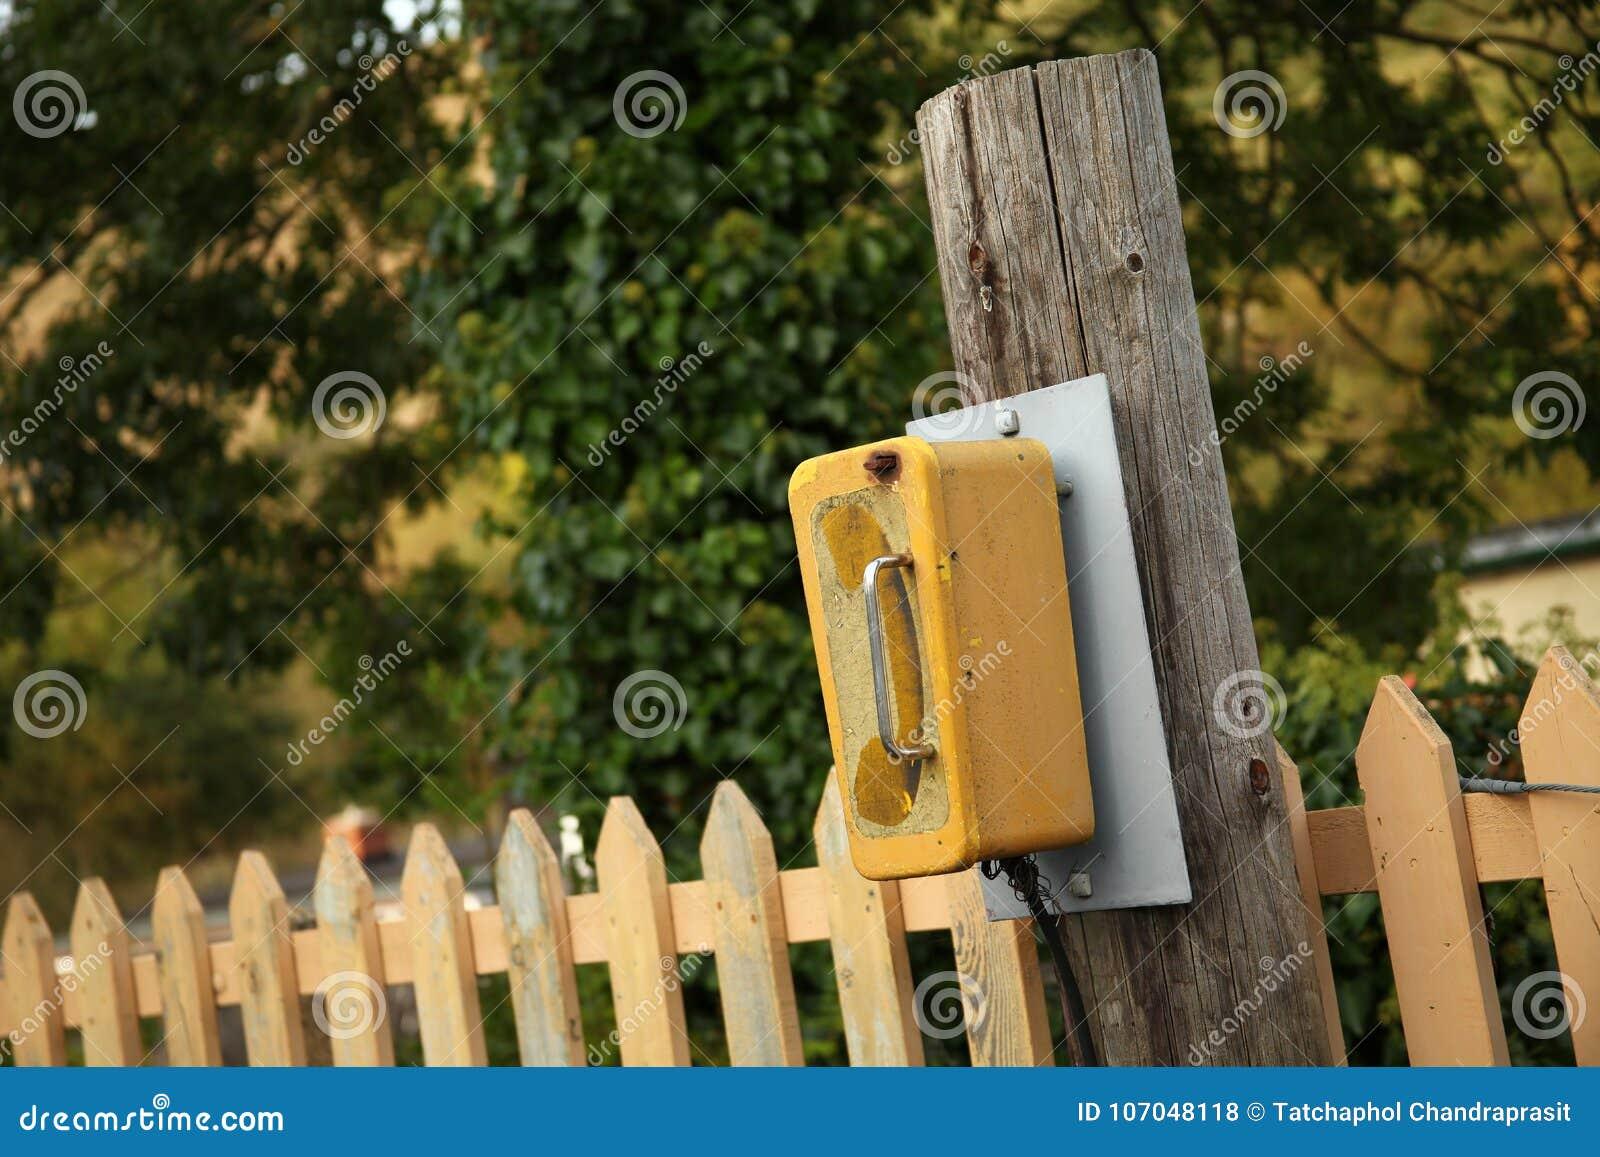 Telephone call box scene  stock photo  Image of conversation